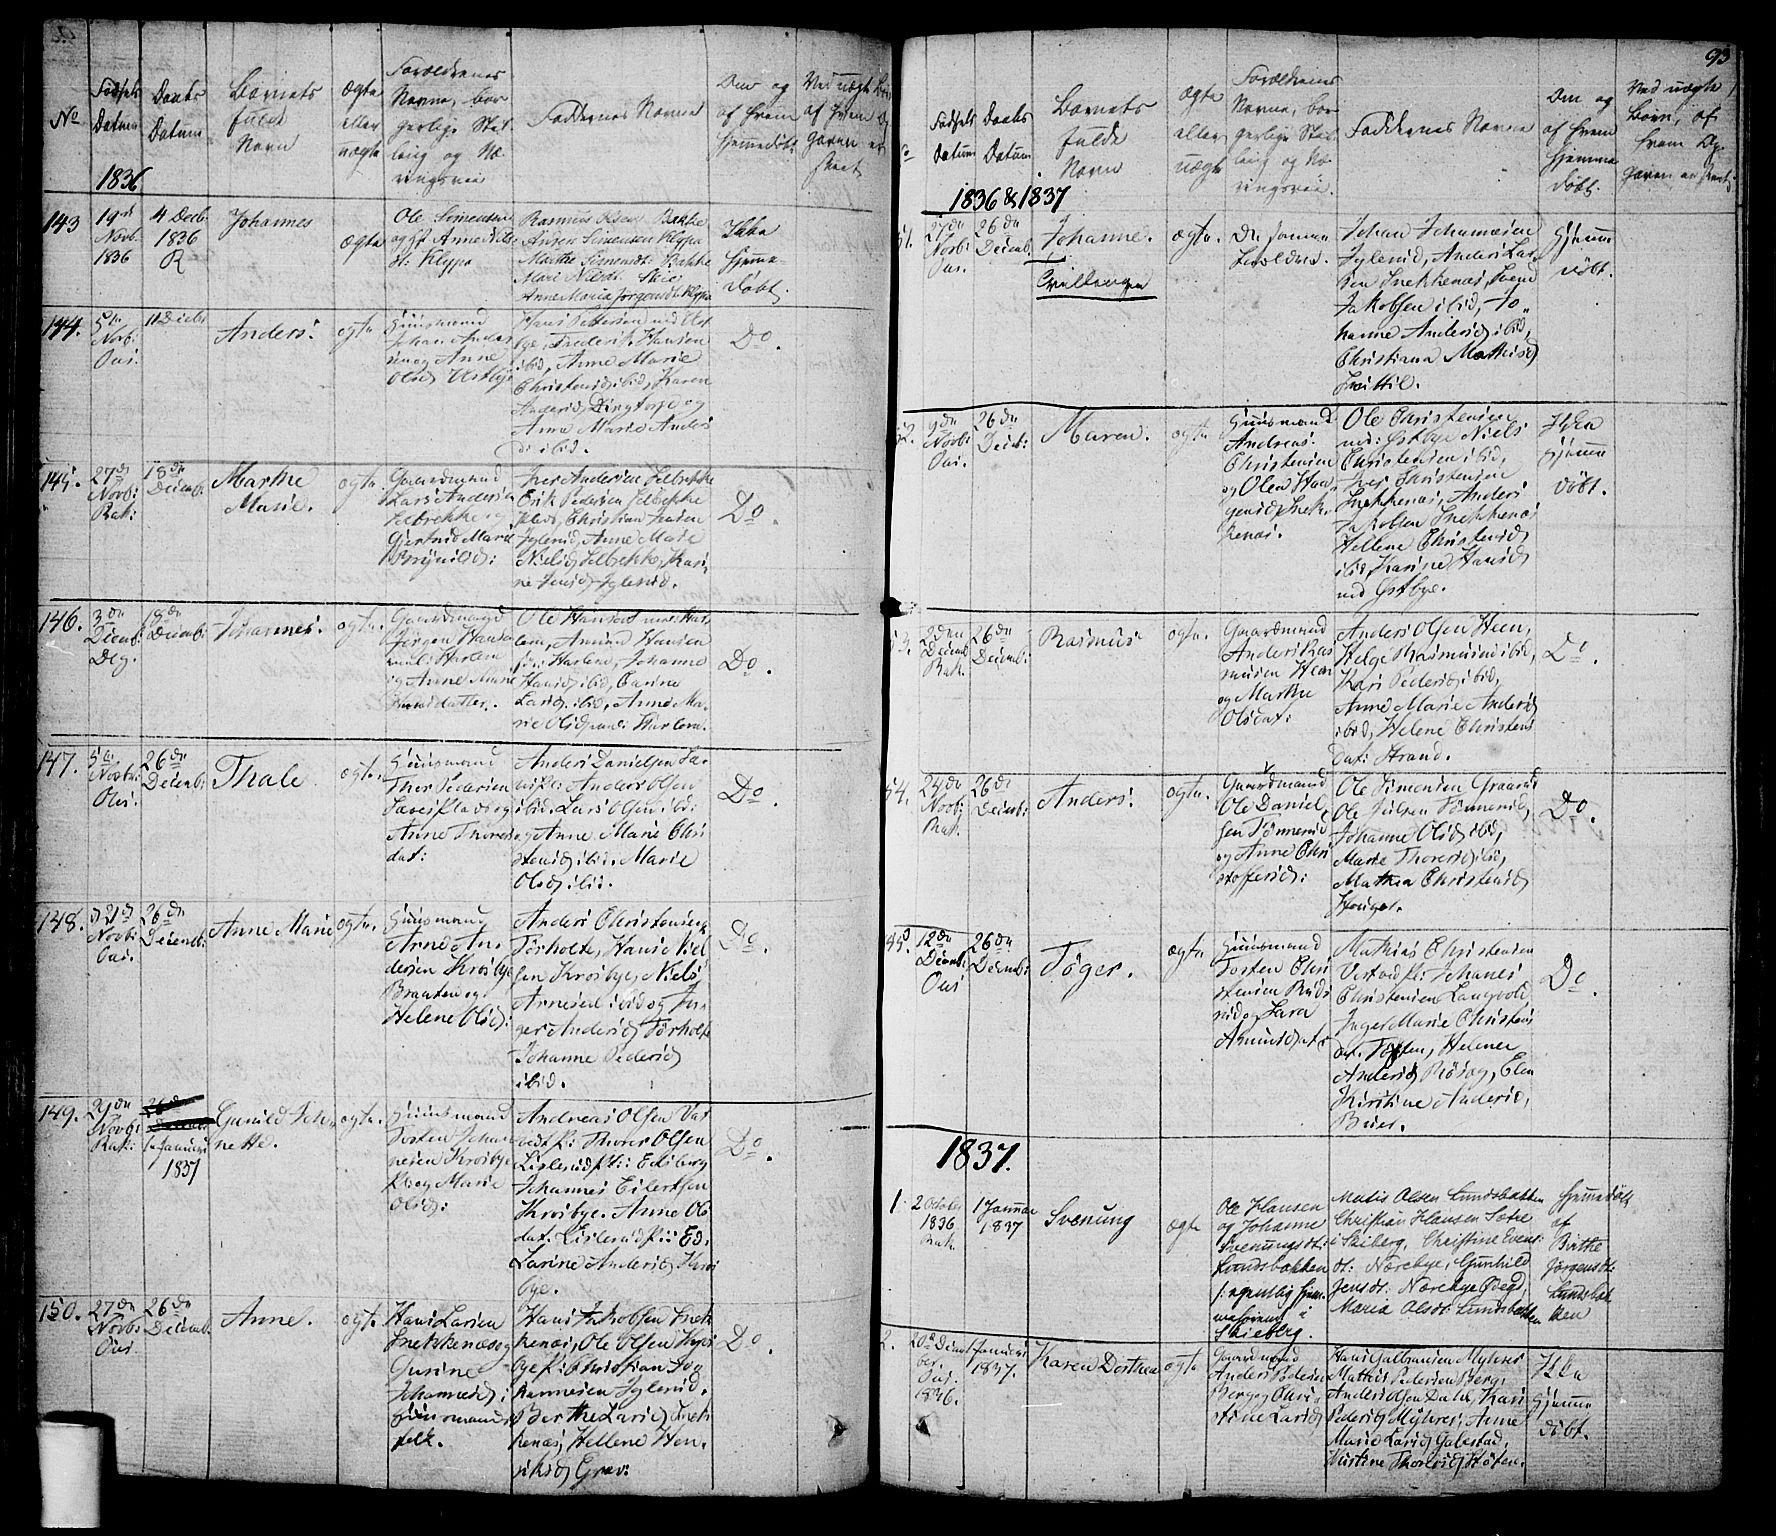 SAO, Rakkestad prestekontor Kirkebøker, F/Fa/L0007: Ministerialbok nr. I 7, 1825-1841, s. 93